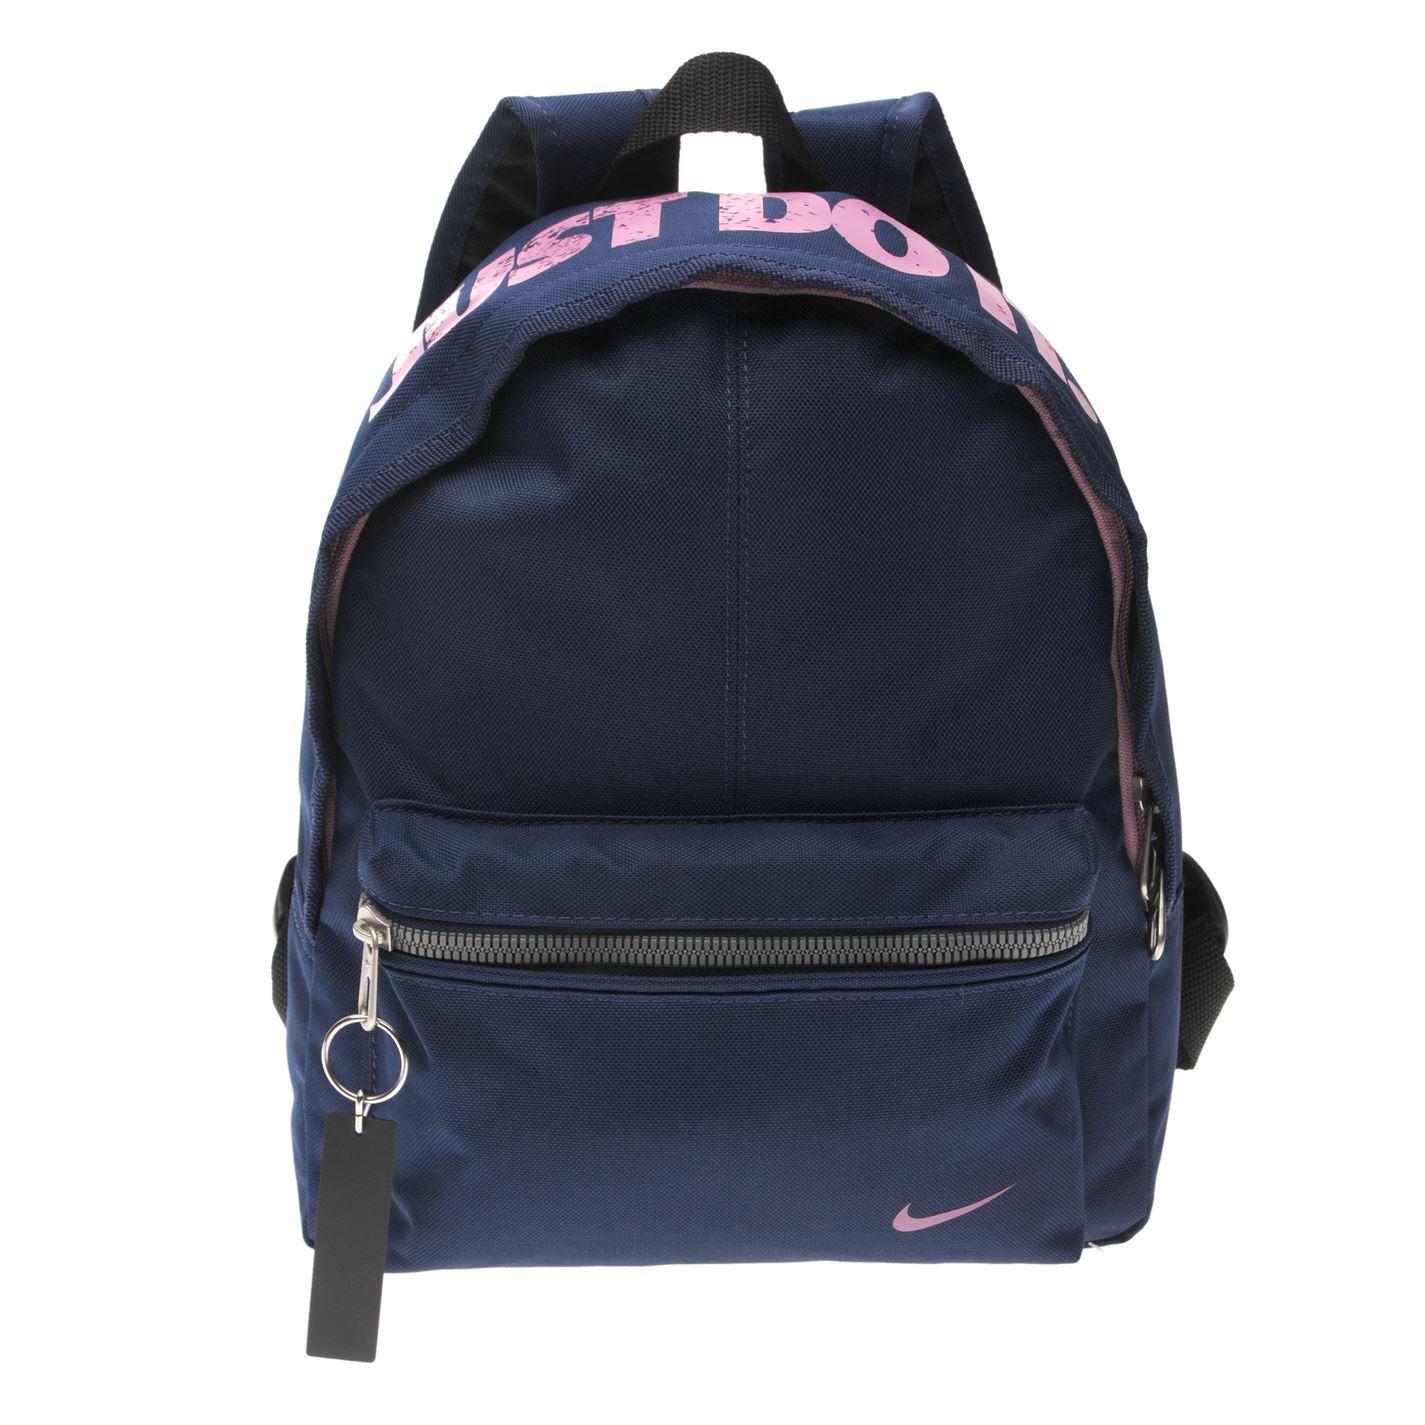 21780cbc63faaa Nike Mini Backpack Sports Direct- Fenix Toulouse Handball